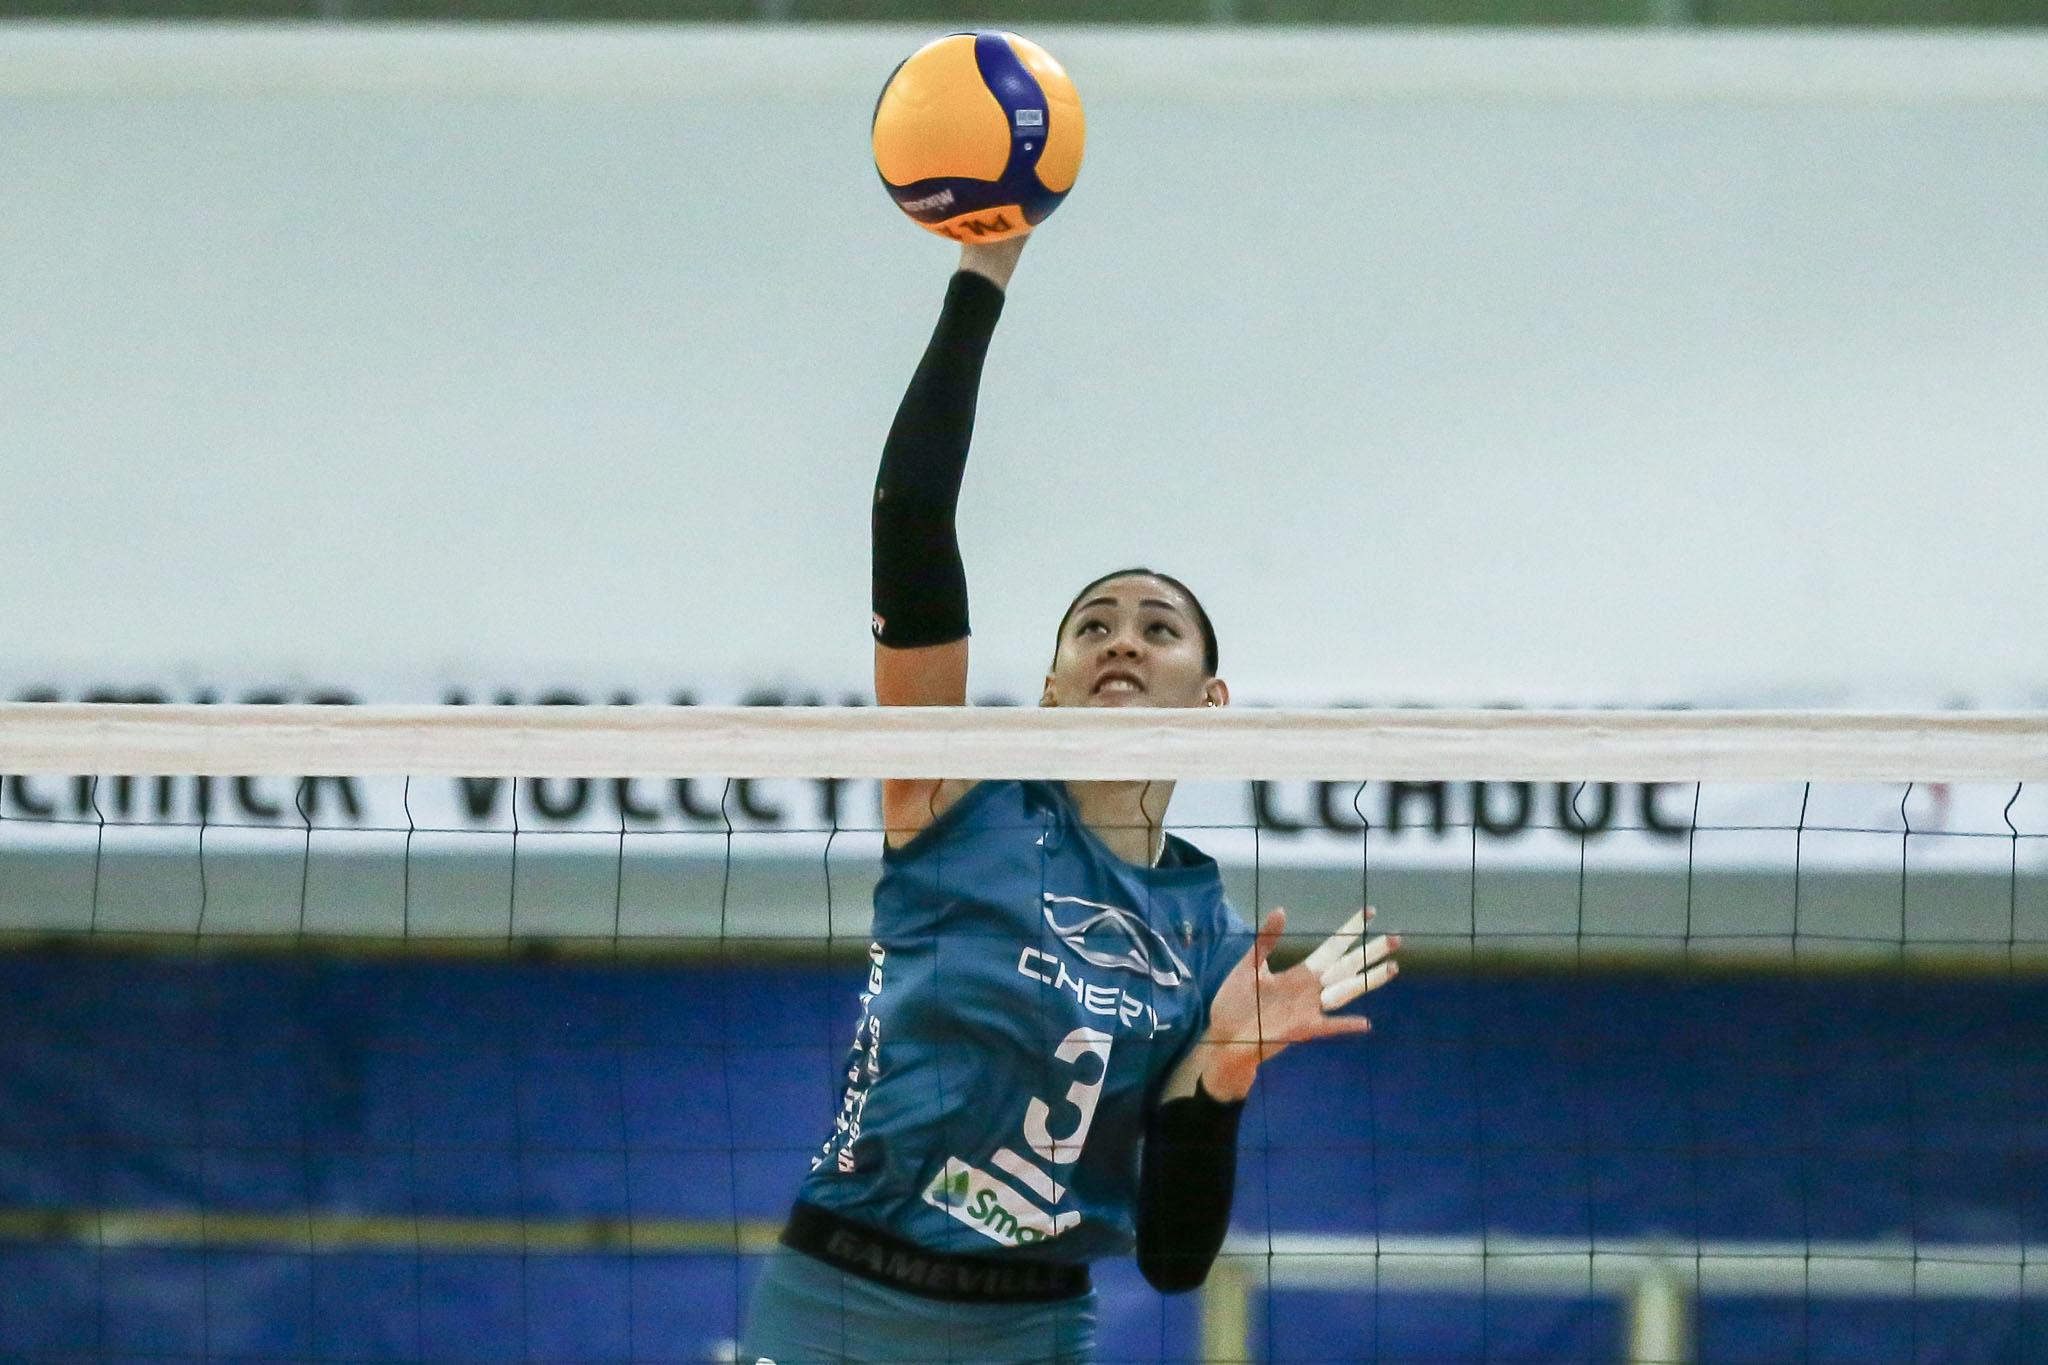 2021-PVL-Open-Chery-Tiggo-vs-Creamline-Jaja-Santiago Jaja Santiago on facing Alyssa Valdez again: 'Nakaka-miss' News PVL Volleyball  - philippine sports news